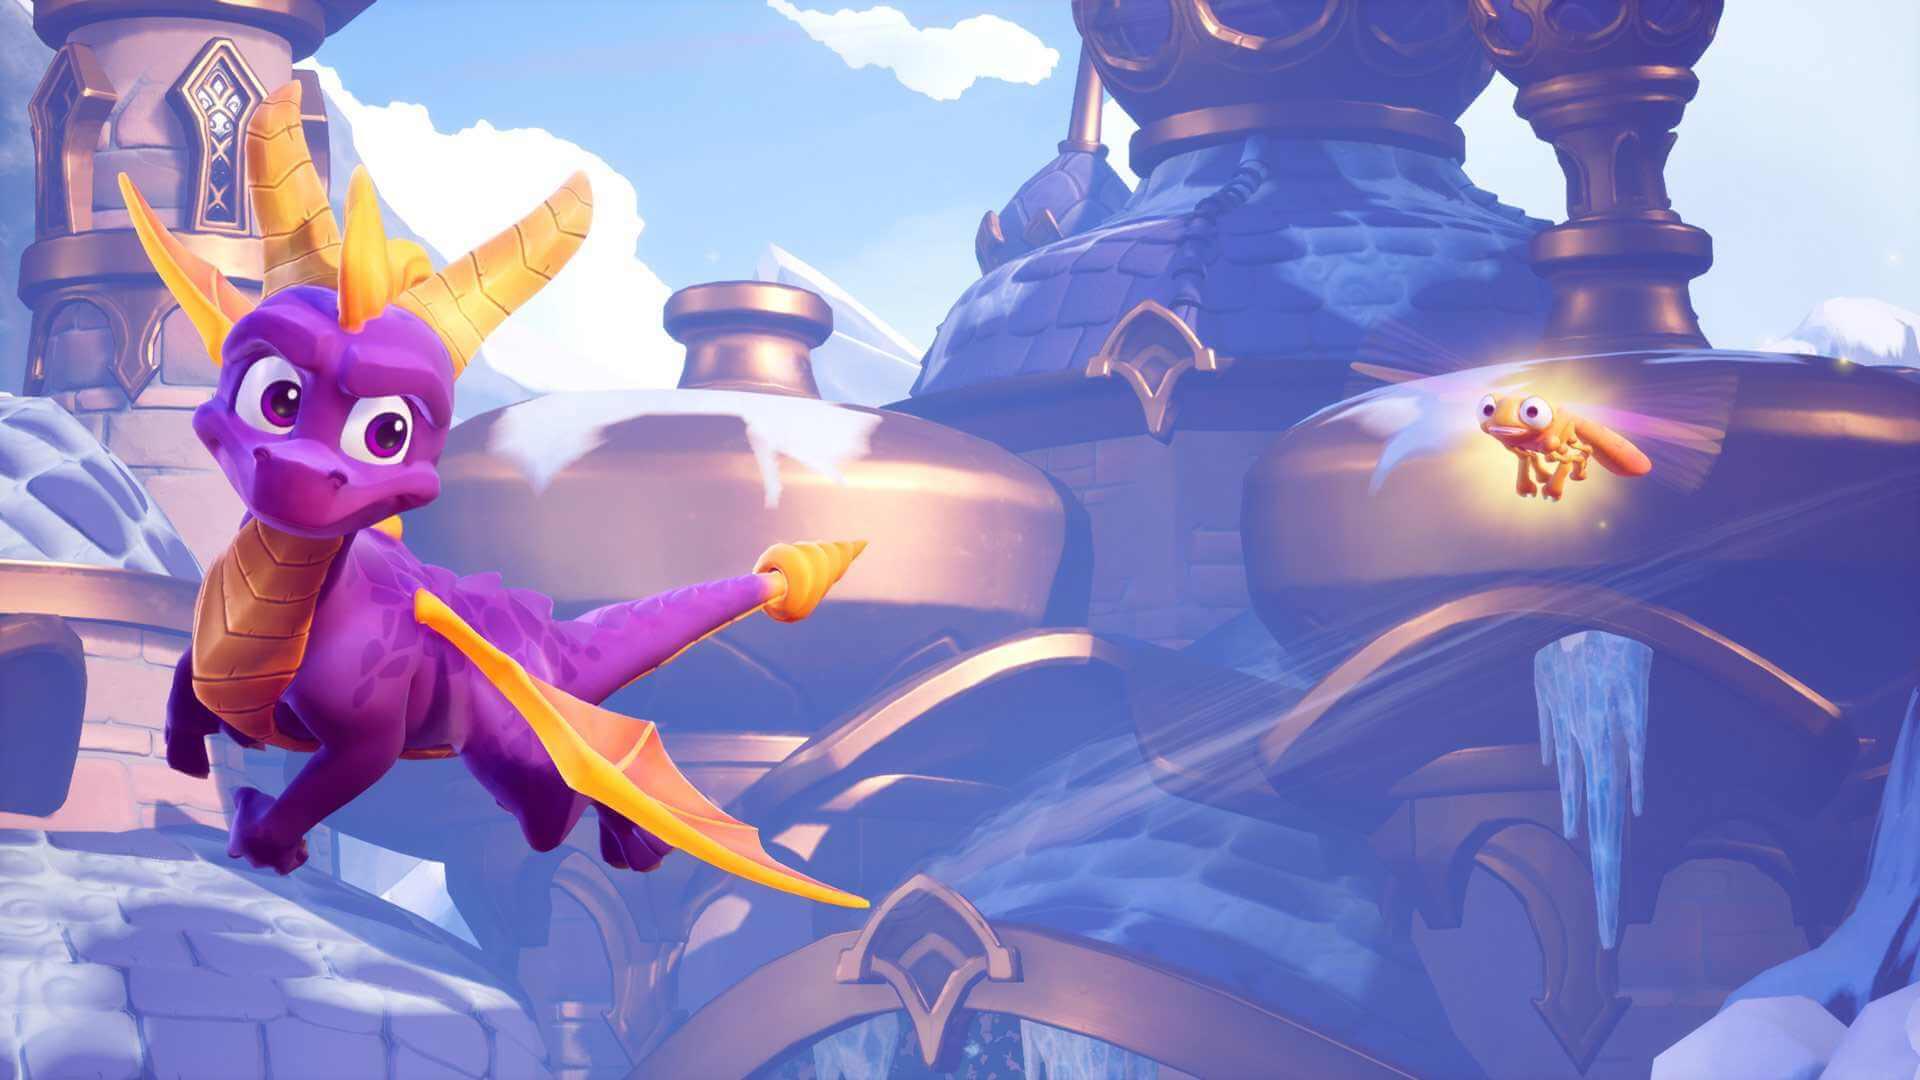 Spyro-Reignited